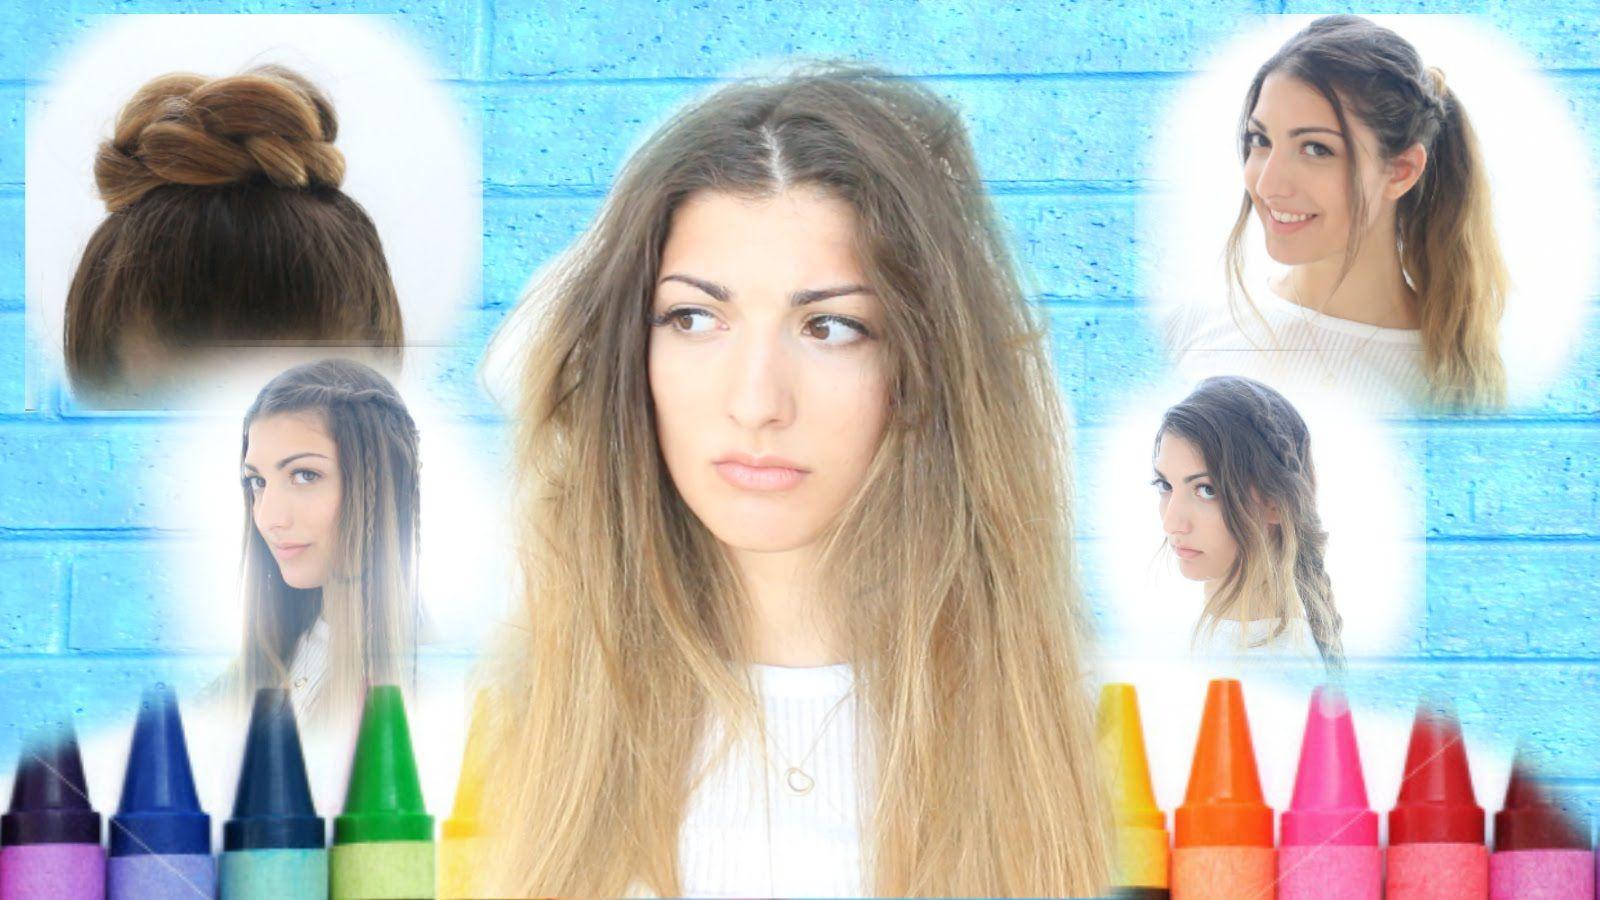 My Back To School Hairstyles Rclbeauty101  hair things